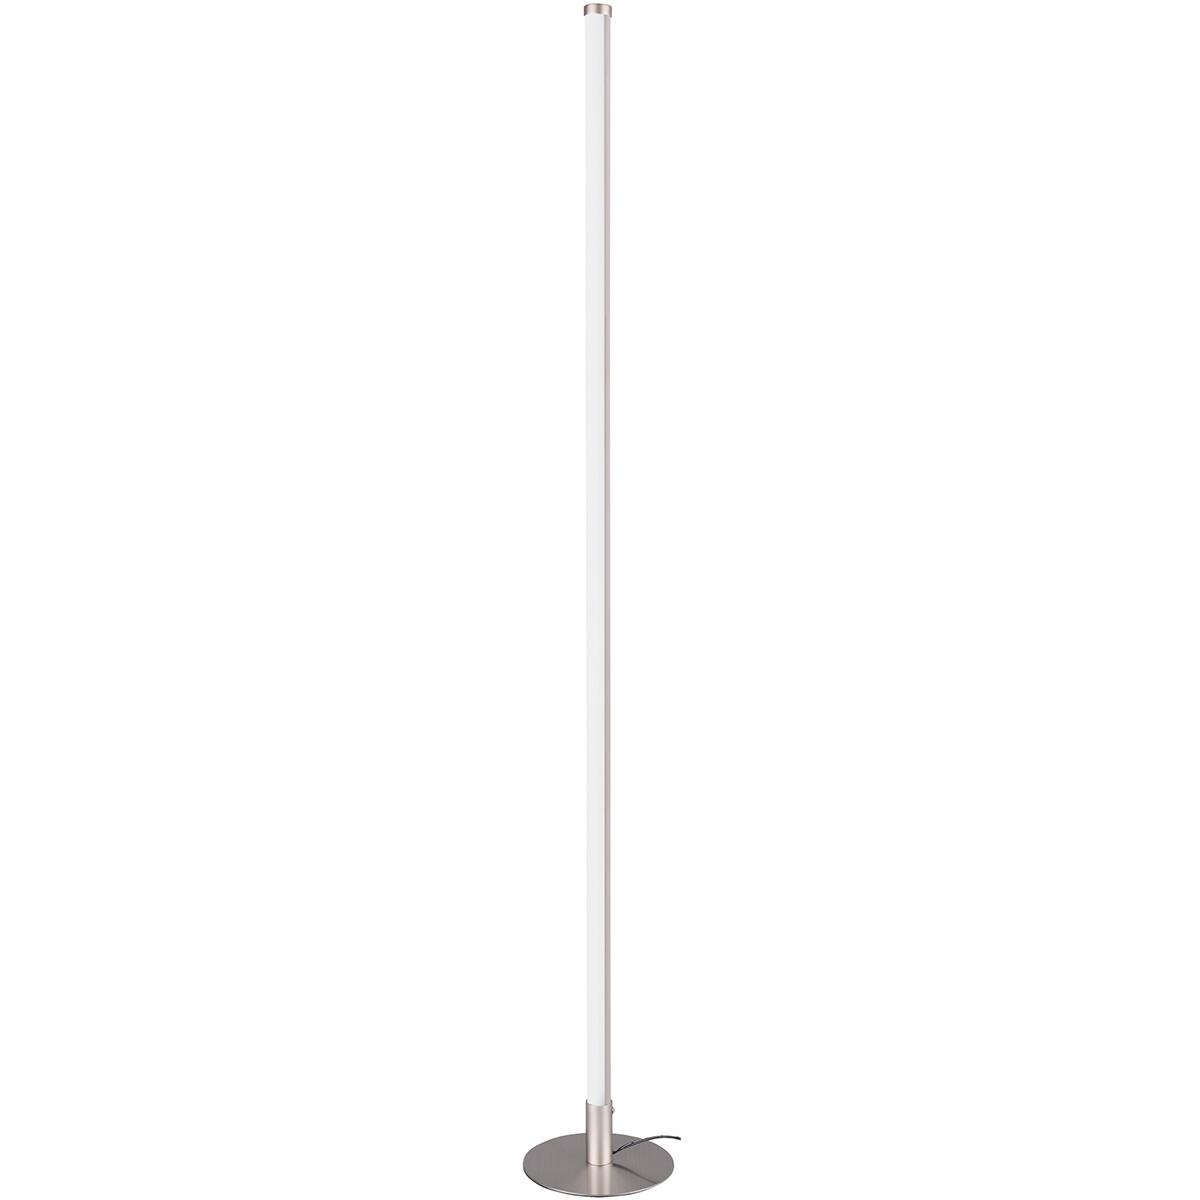 LED Vloerlamp WiZ - Smart LED - Trion Samada - 6W - Aanpasbare Kleur - Dimbaar - Rond - Mat Nikkel -